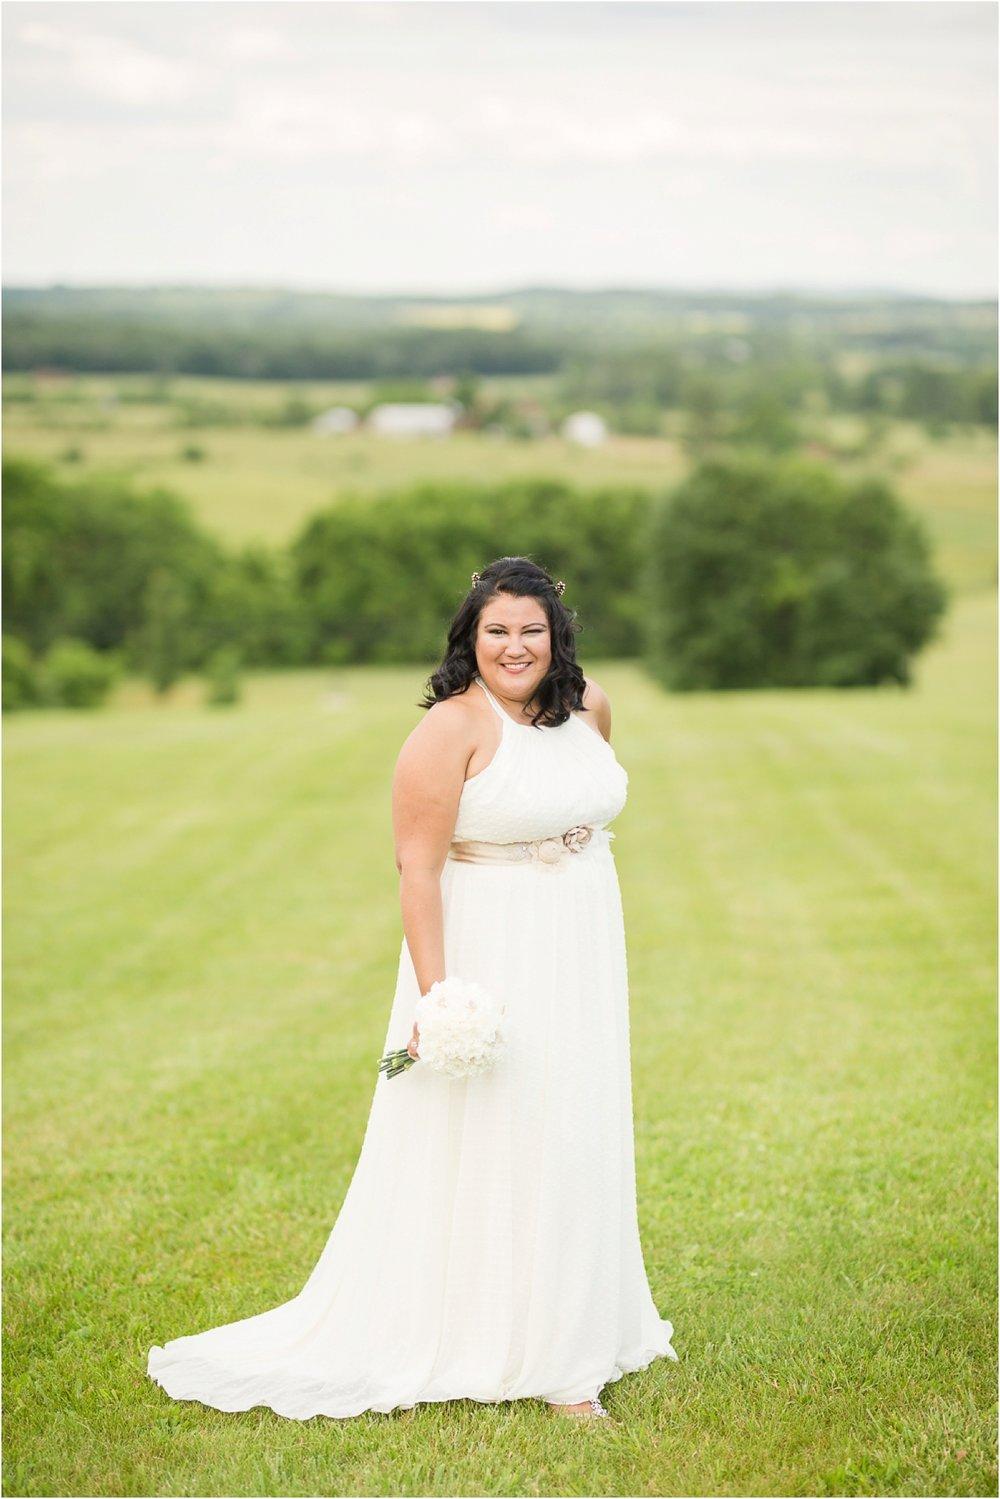 Gettysburg-Lodges-Wedding-182.jpg